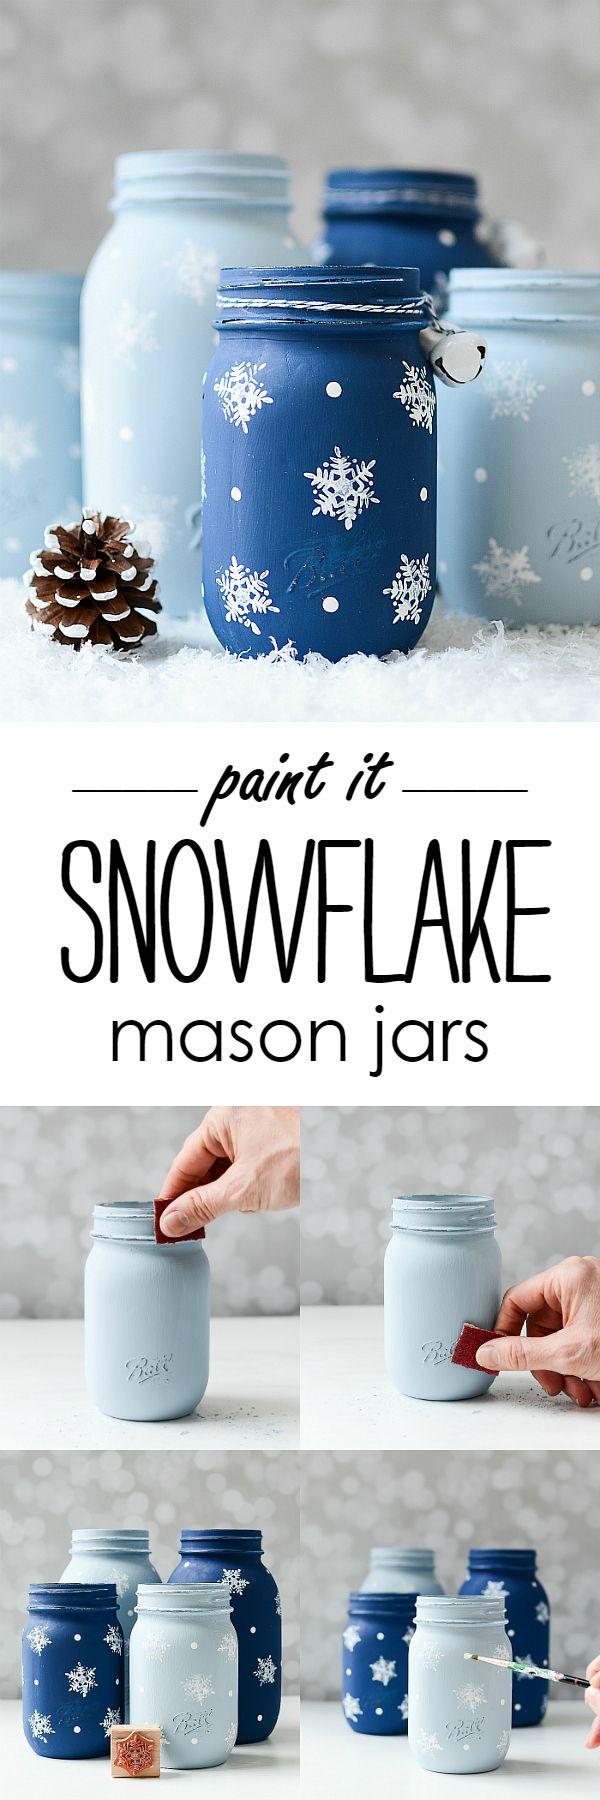 Snowflake Mason Jars - Stamped Snowflake Painted Mason Jars @It All Started With Paint blog